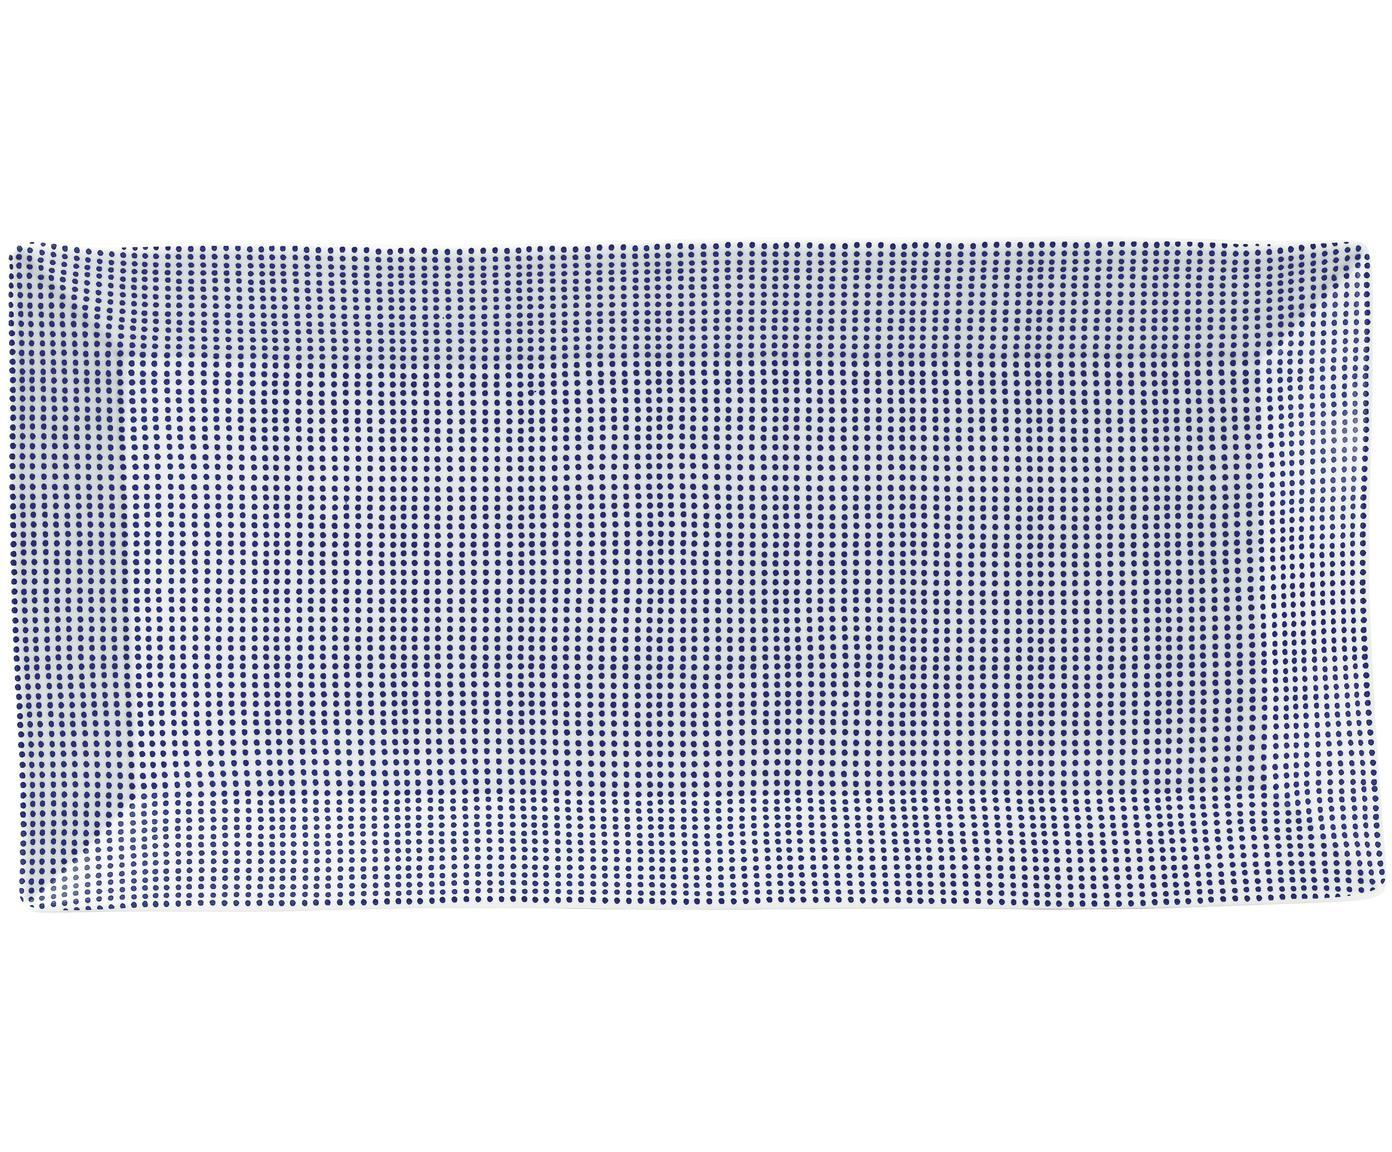 Serveerbord Pacific, Porselein, Wit, blauw, 18 x 39 cm